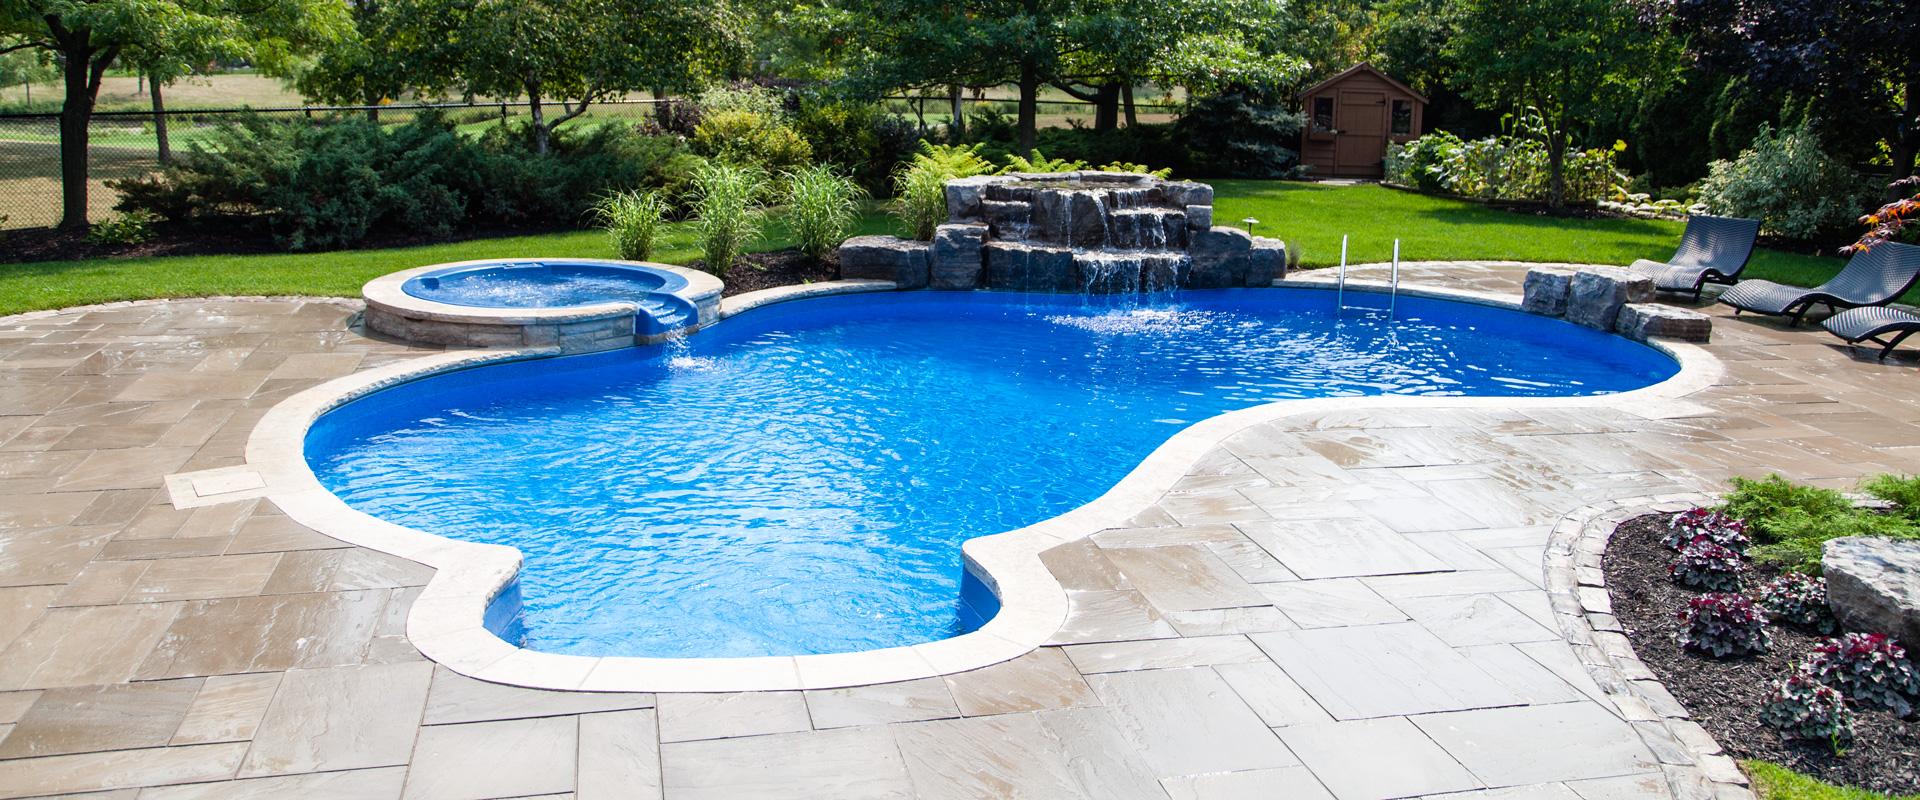 Swimming Pool Liners Pioneer Family Pools